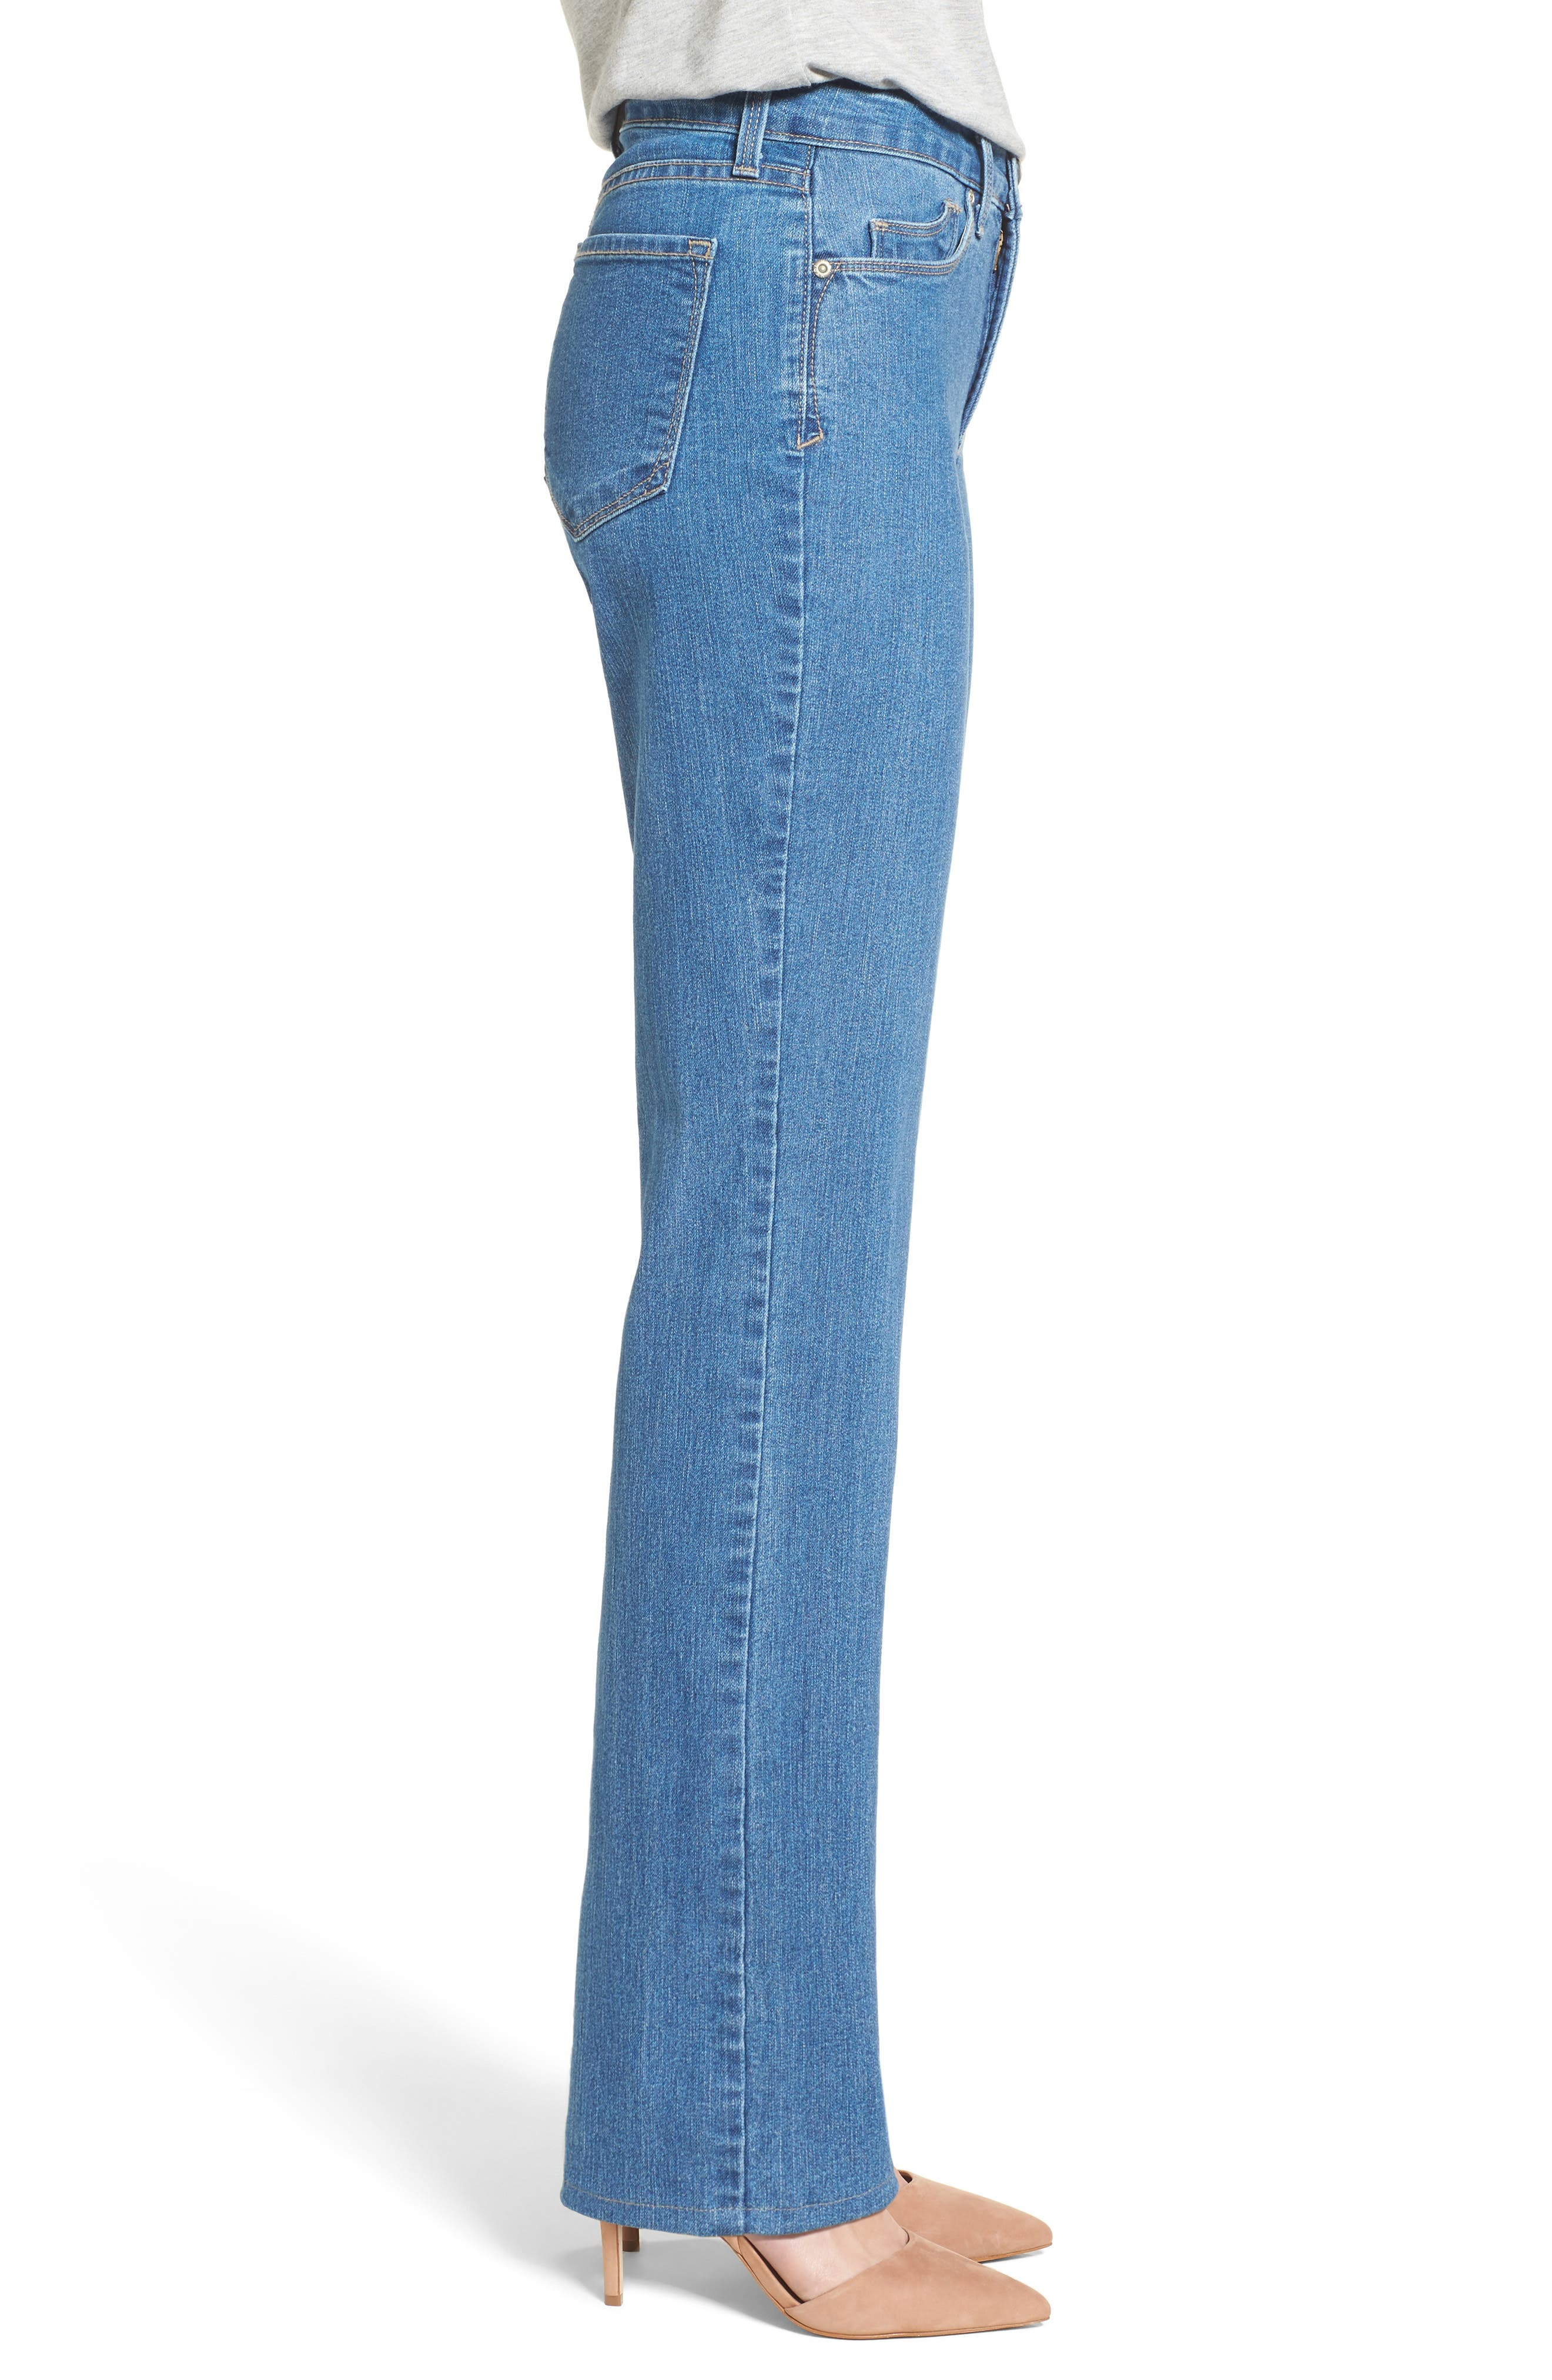 Marilyn Stretch Straight Leg Jeans,                             Alternate thumbnail 3, color,                             424